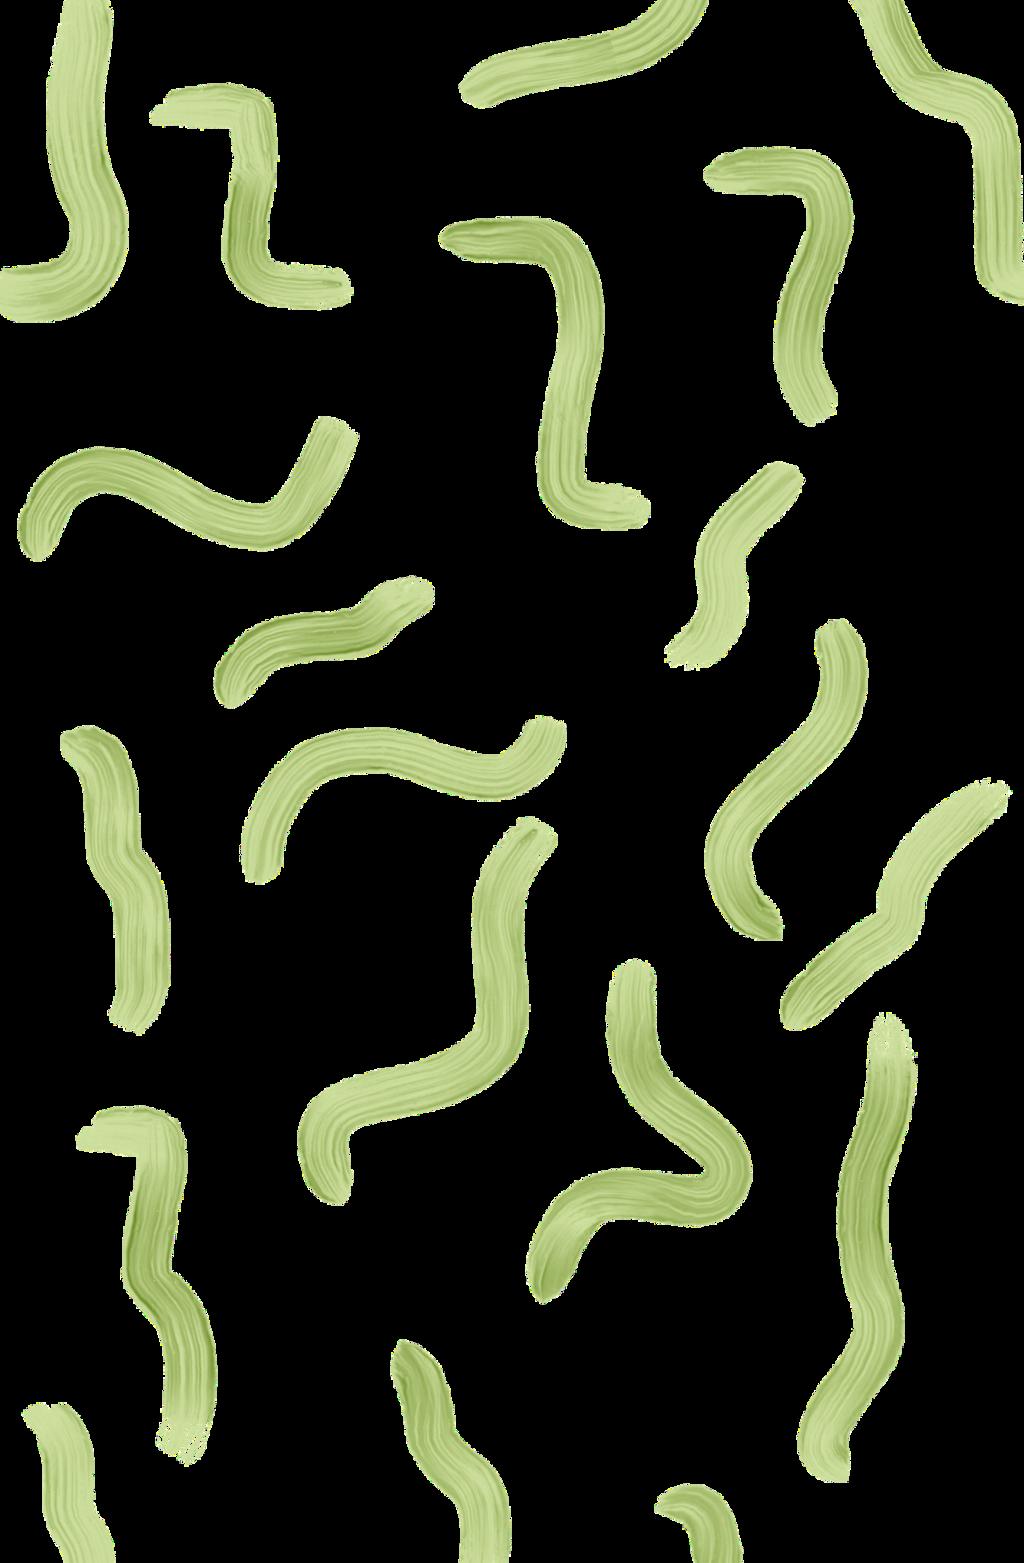 this said 〰️ #green #greenaesthetic #palegreen #aesthetics #cool #edit #sticker #vsco #photoedit #art #artsy #create #trend #trendy #radical #rad #groovy #freetoedit